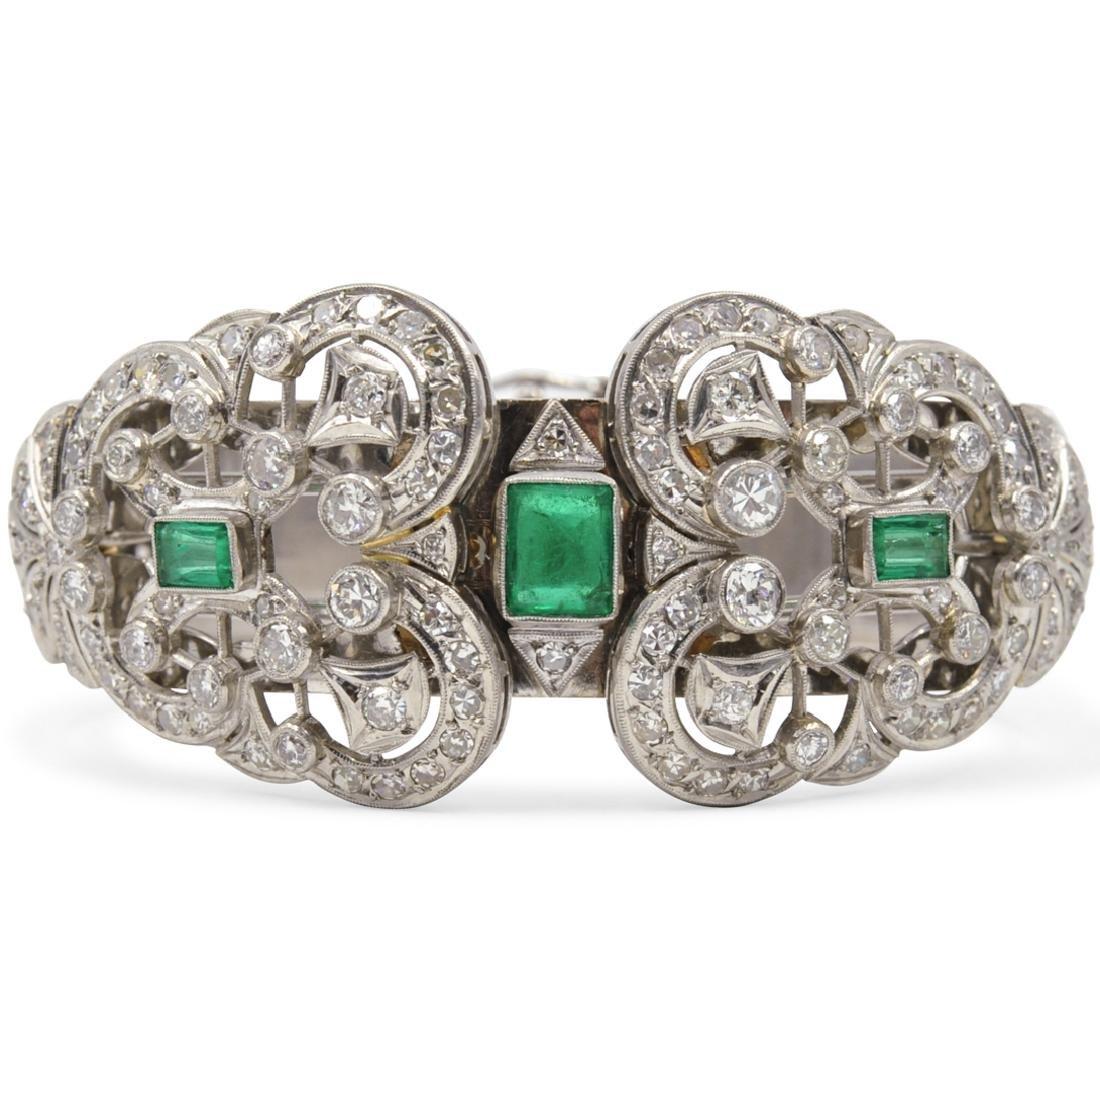 Vintage 18K Emerald and Diamond Functional Bracelet